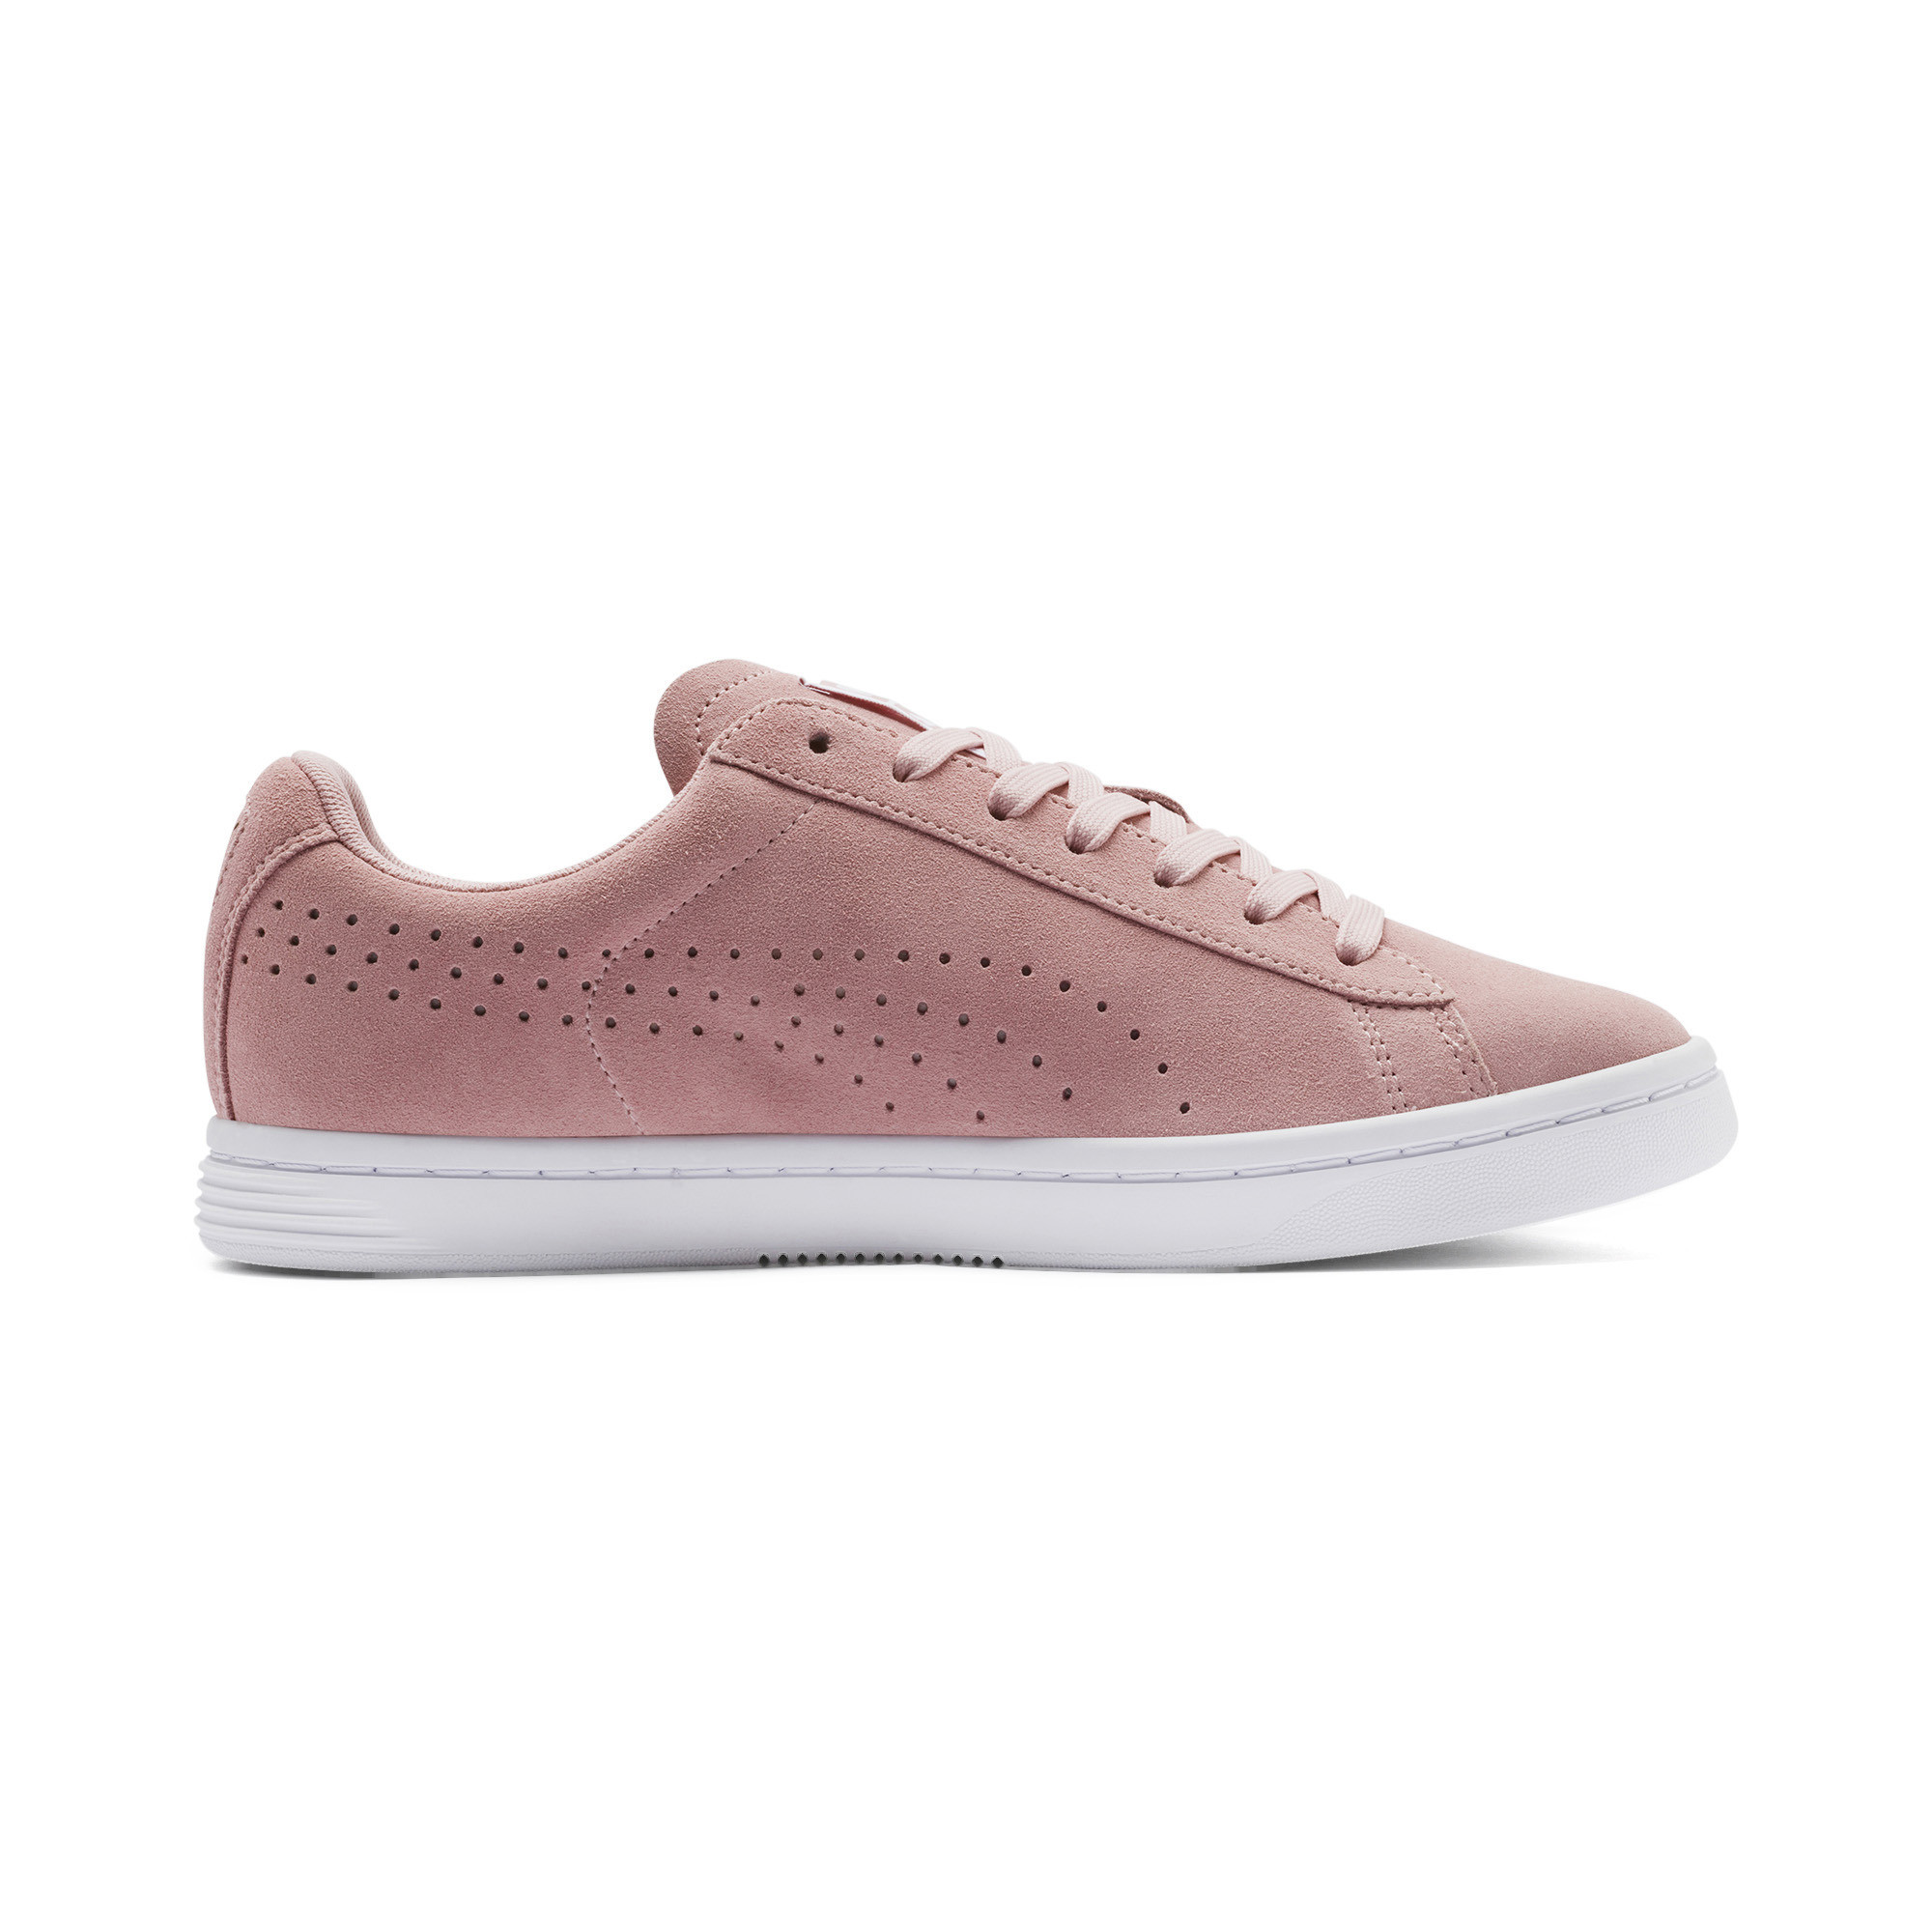 PUMA-Court-Star-Suede-Sneakers-Unisex-Shoe-Sport-Classics thumbnail 7